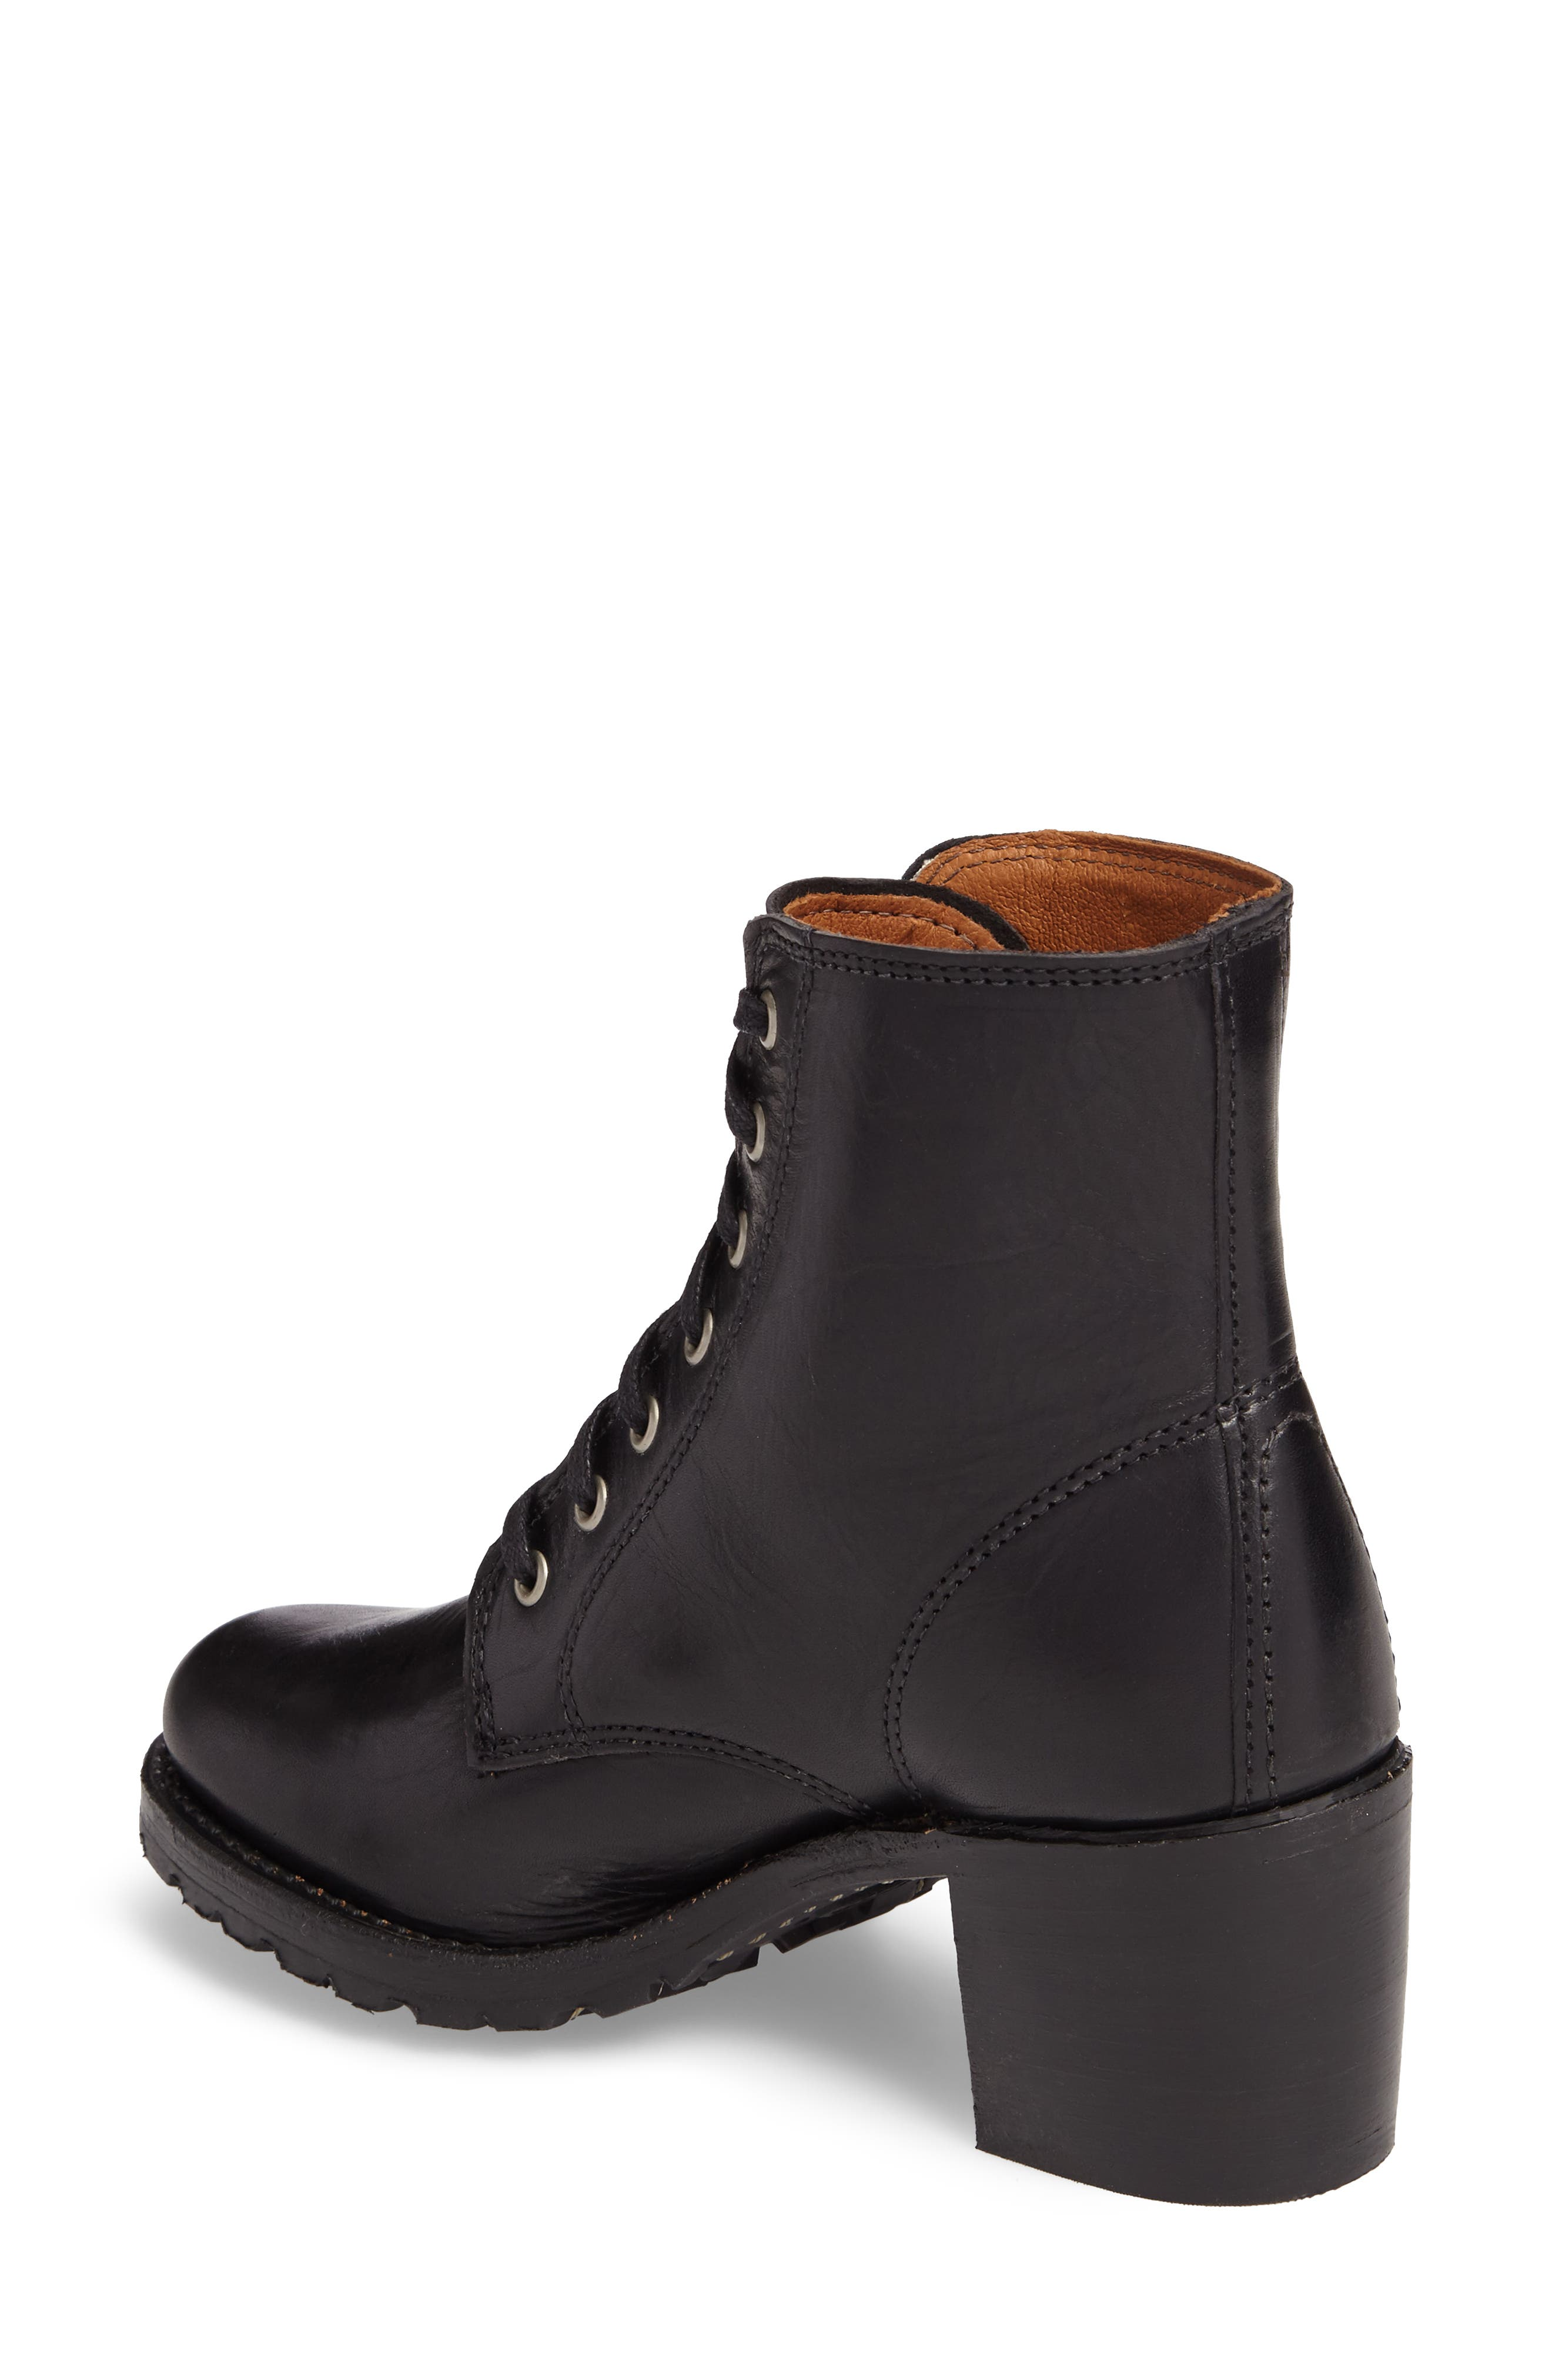 FRYE, Sabrina 6G Lace-Up Boot, Alternate thumbnail 2, color, BLACK